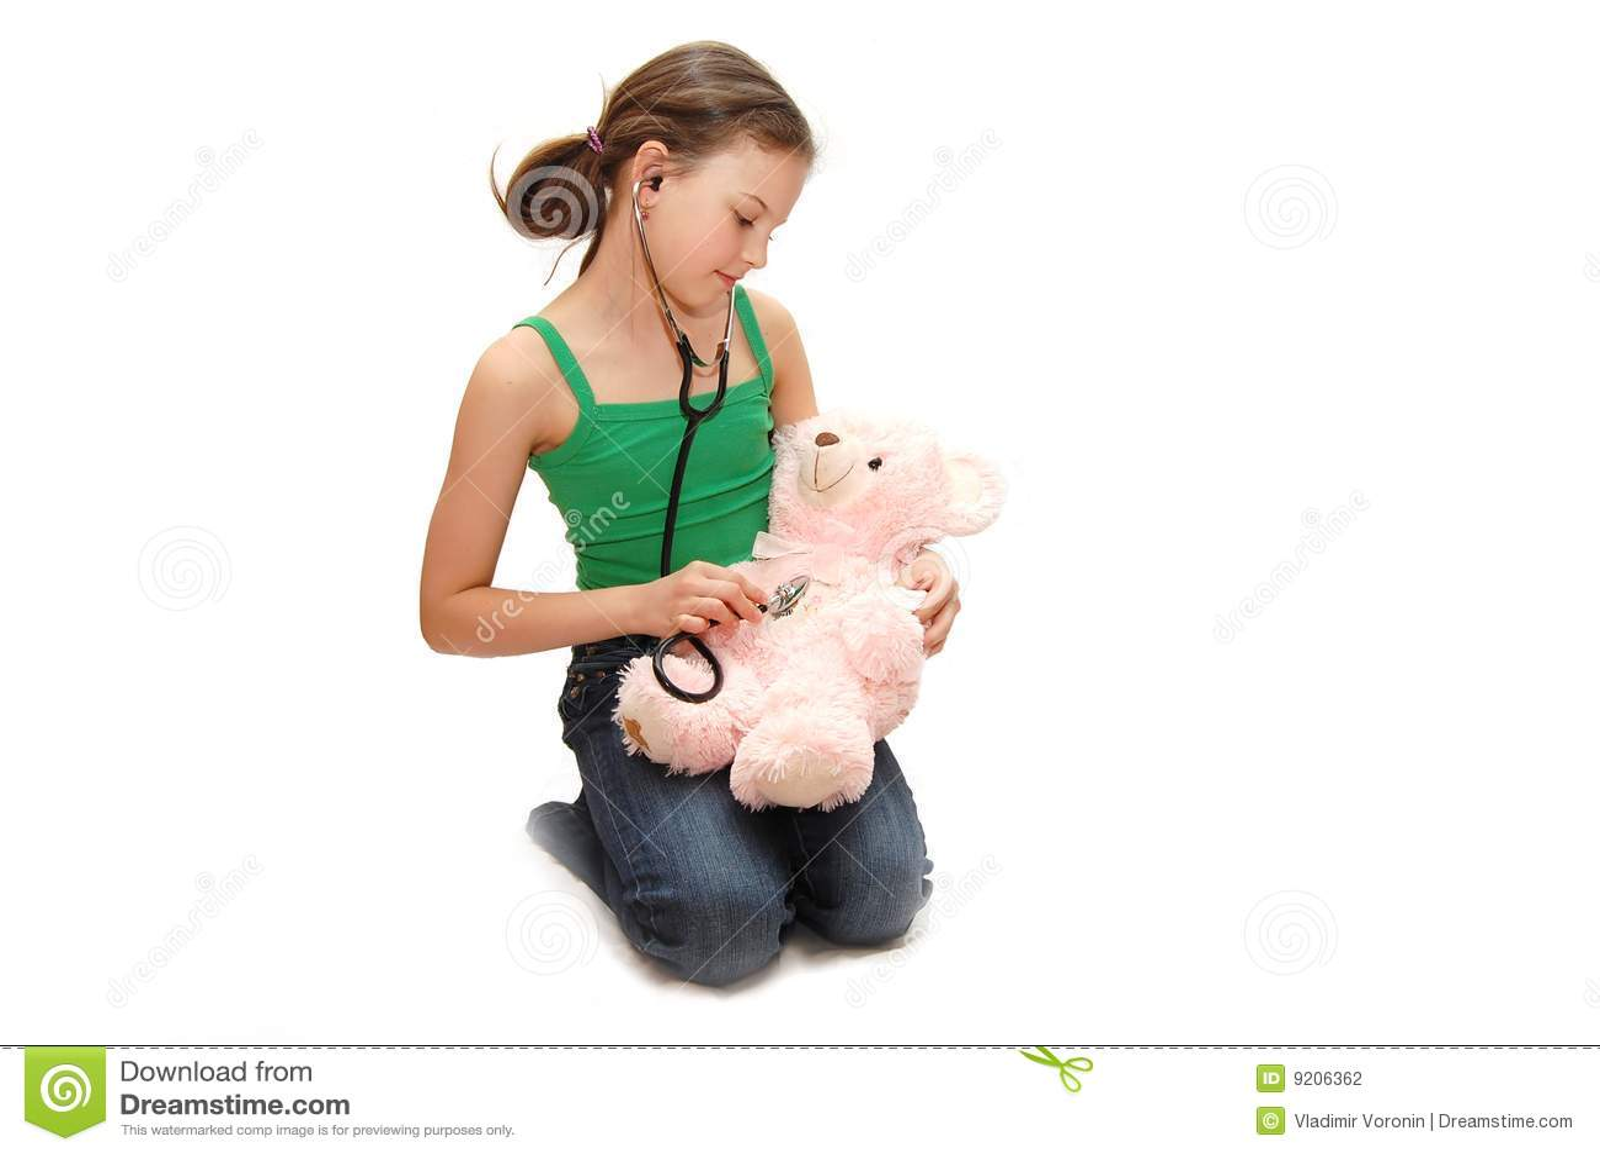 The girl the teenager treats a bear